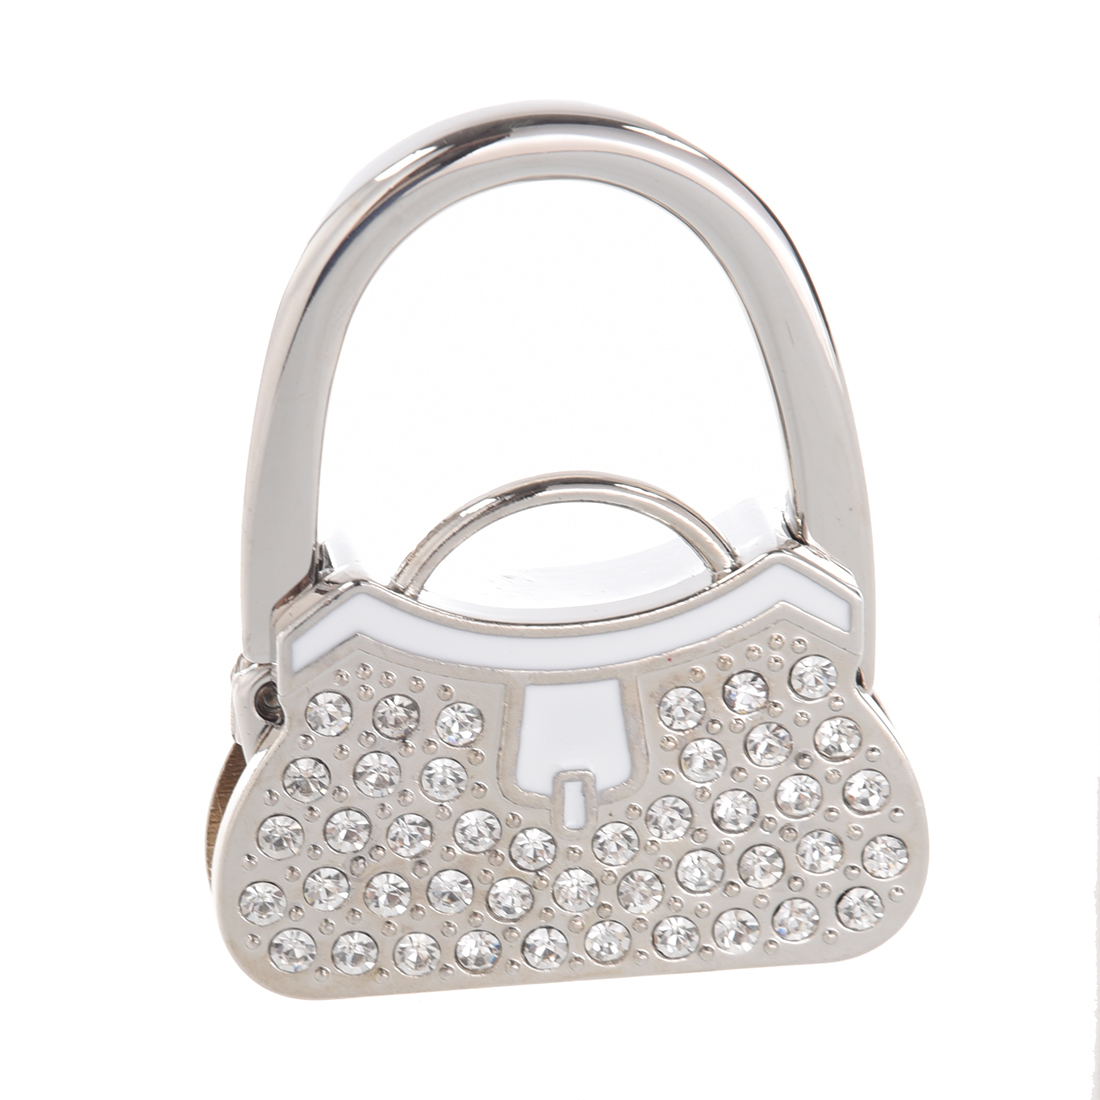 5pcs Boutique Metal Rhinestone Folding Handbag Purse Table Hook Hanger Holder lily flowers pattern metal foldable purse handbag hook table bag holder